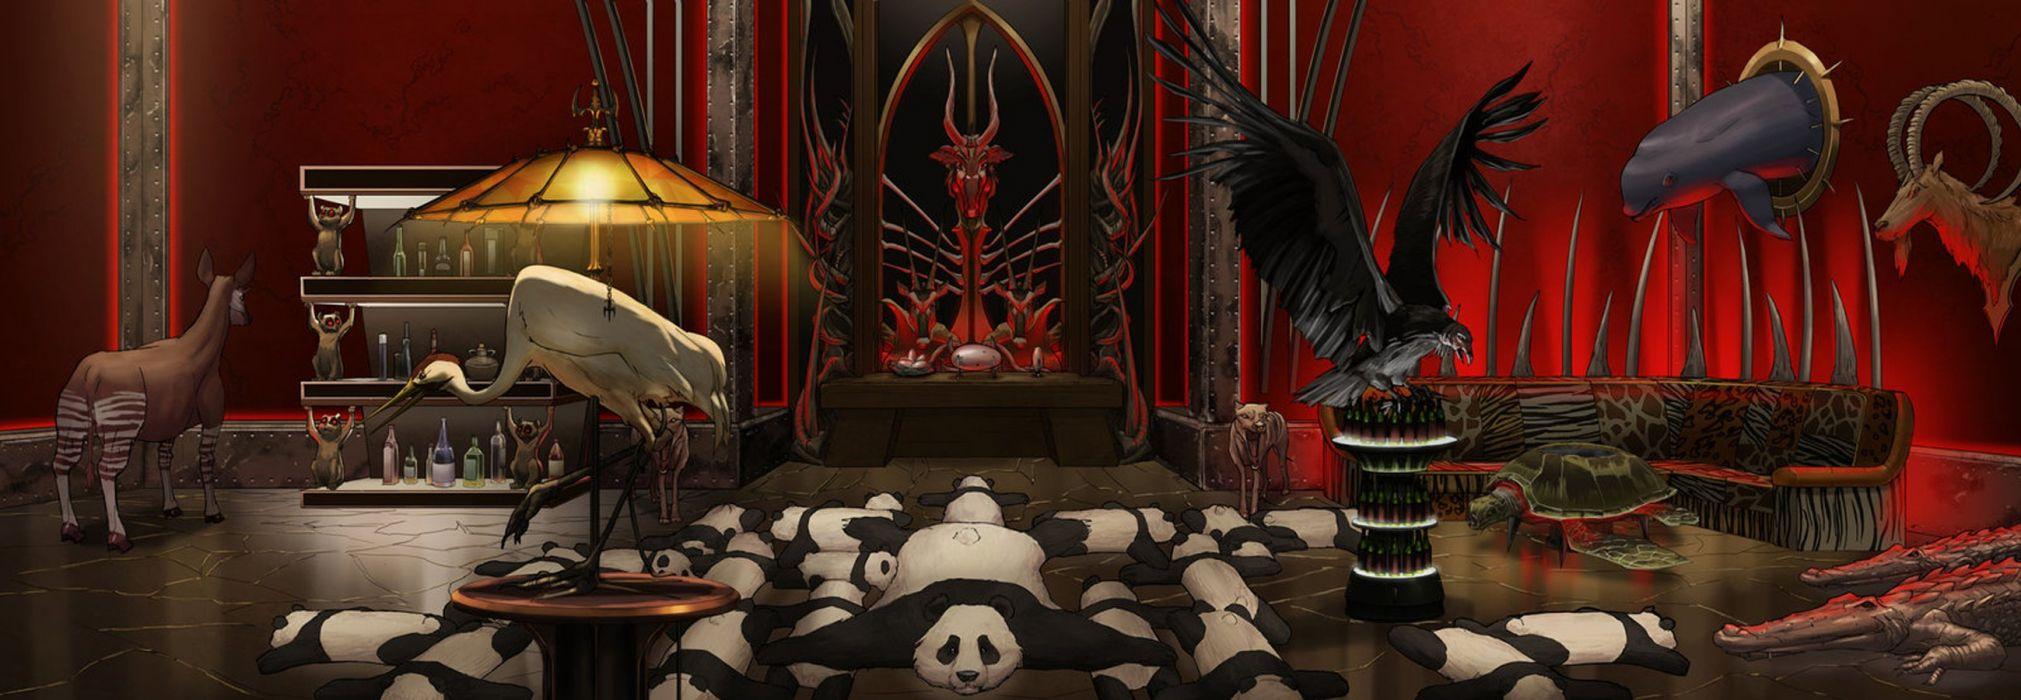 death sad mood panda bird tiger political politics sadic wallpaper